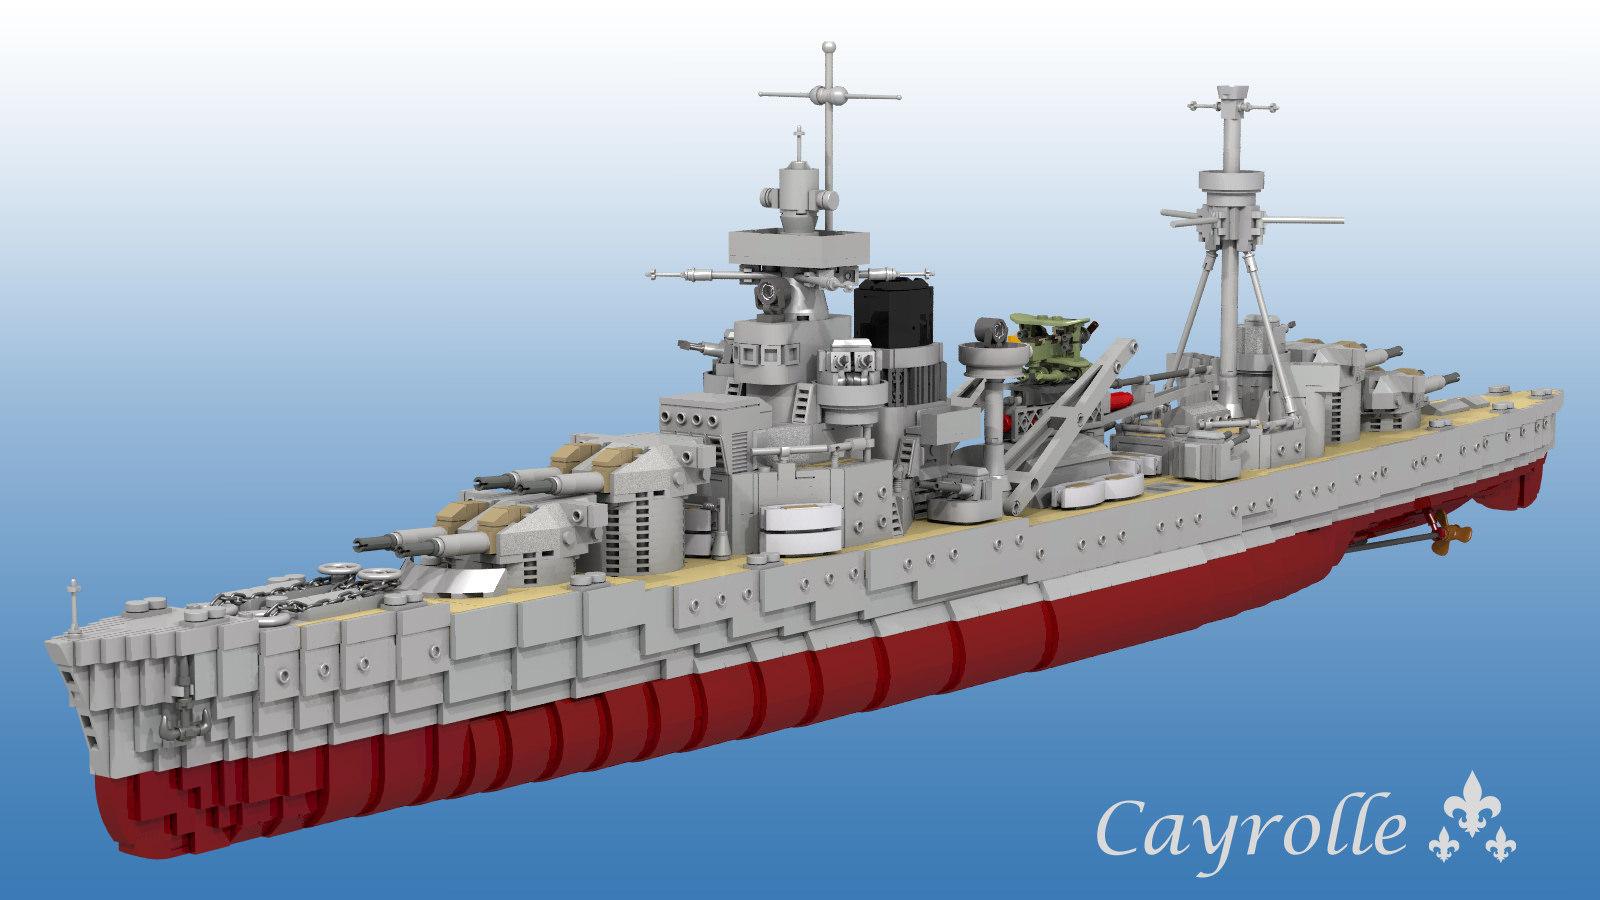 Yann, Cayrolle Class Heavy Cruiser